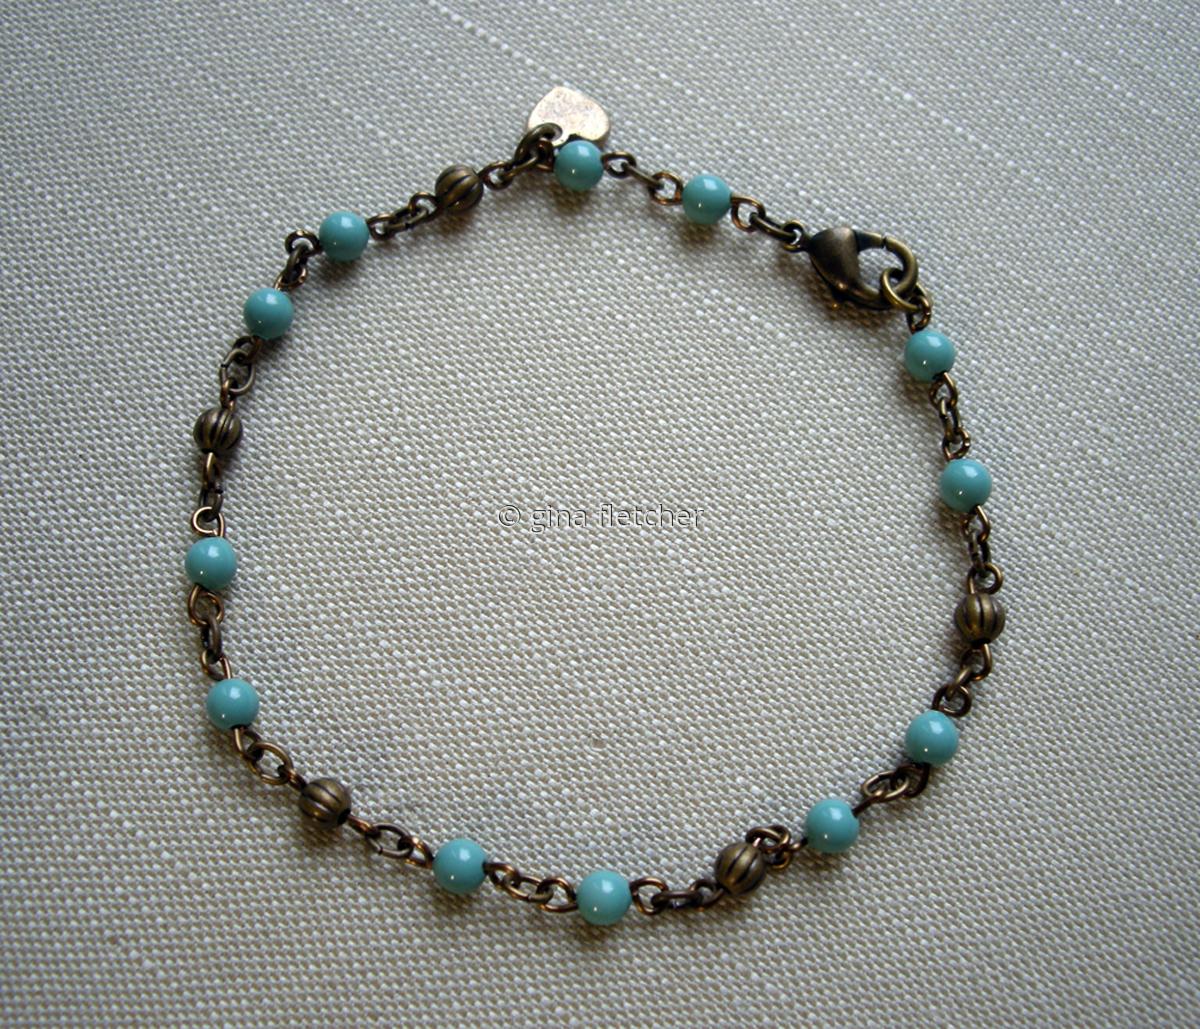 pearl bracelet . . .#011 (large view)